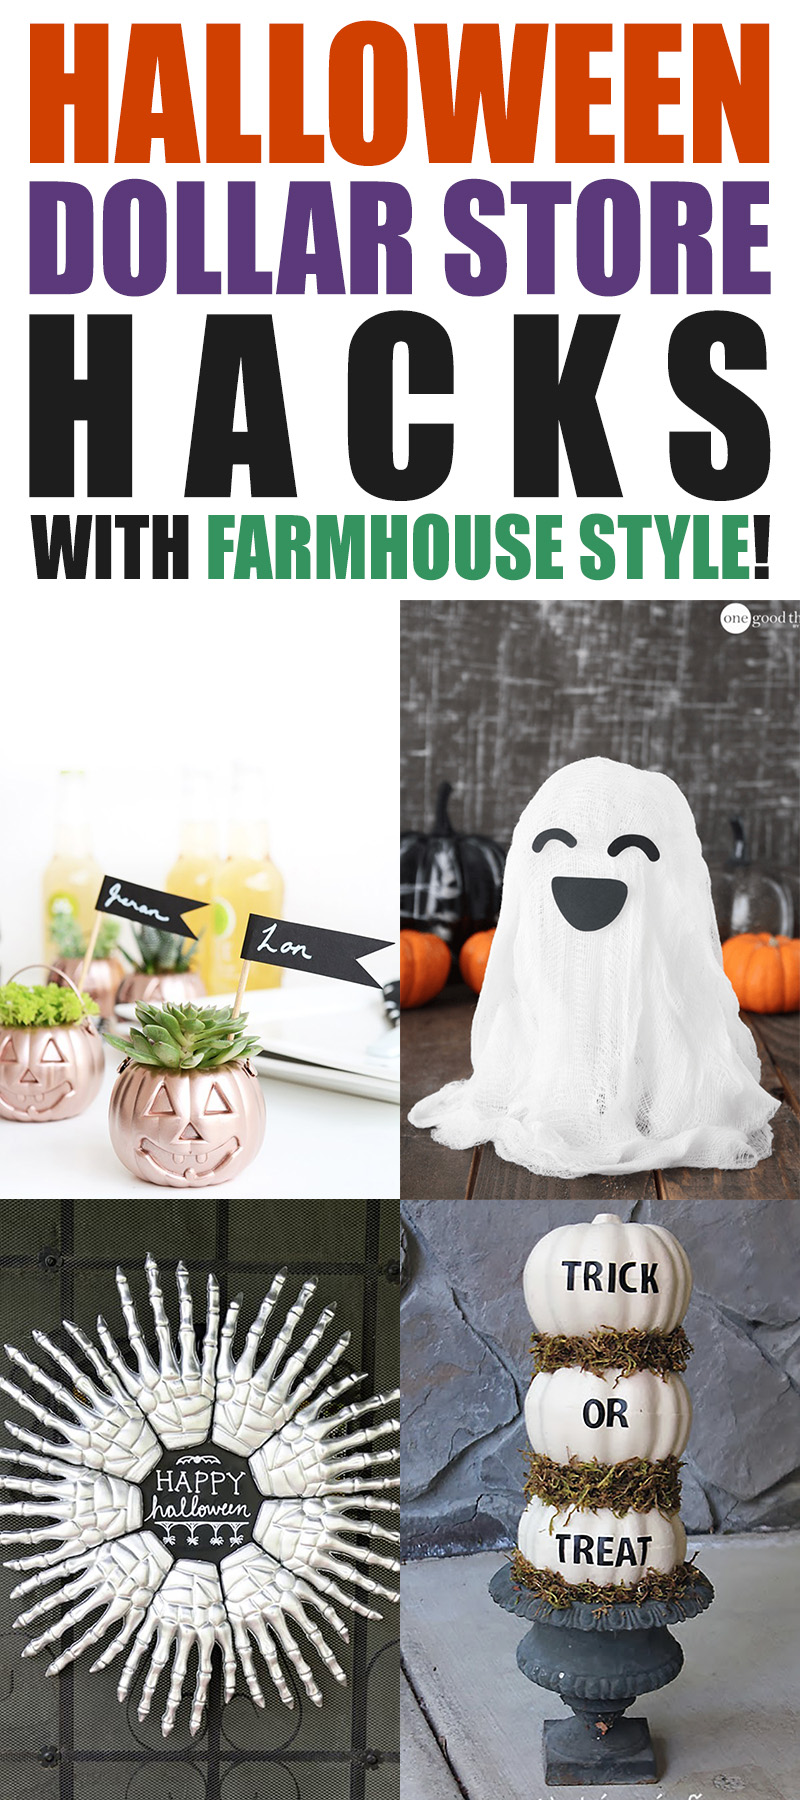 Halloween Dollar Store Hacks with Farmhouse Style